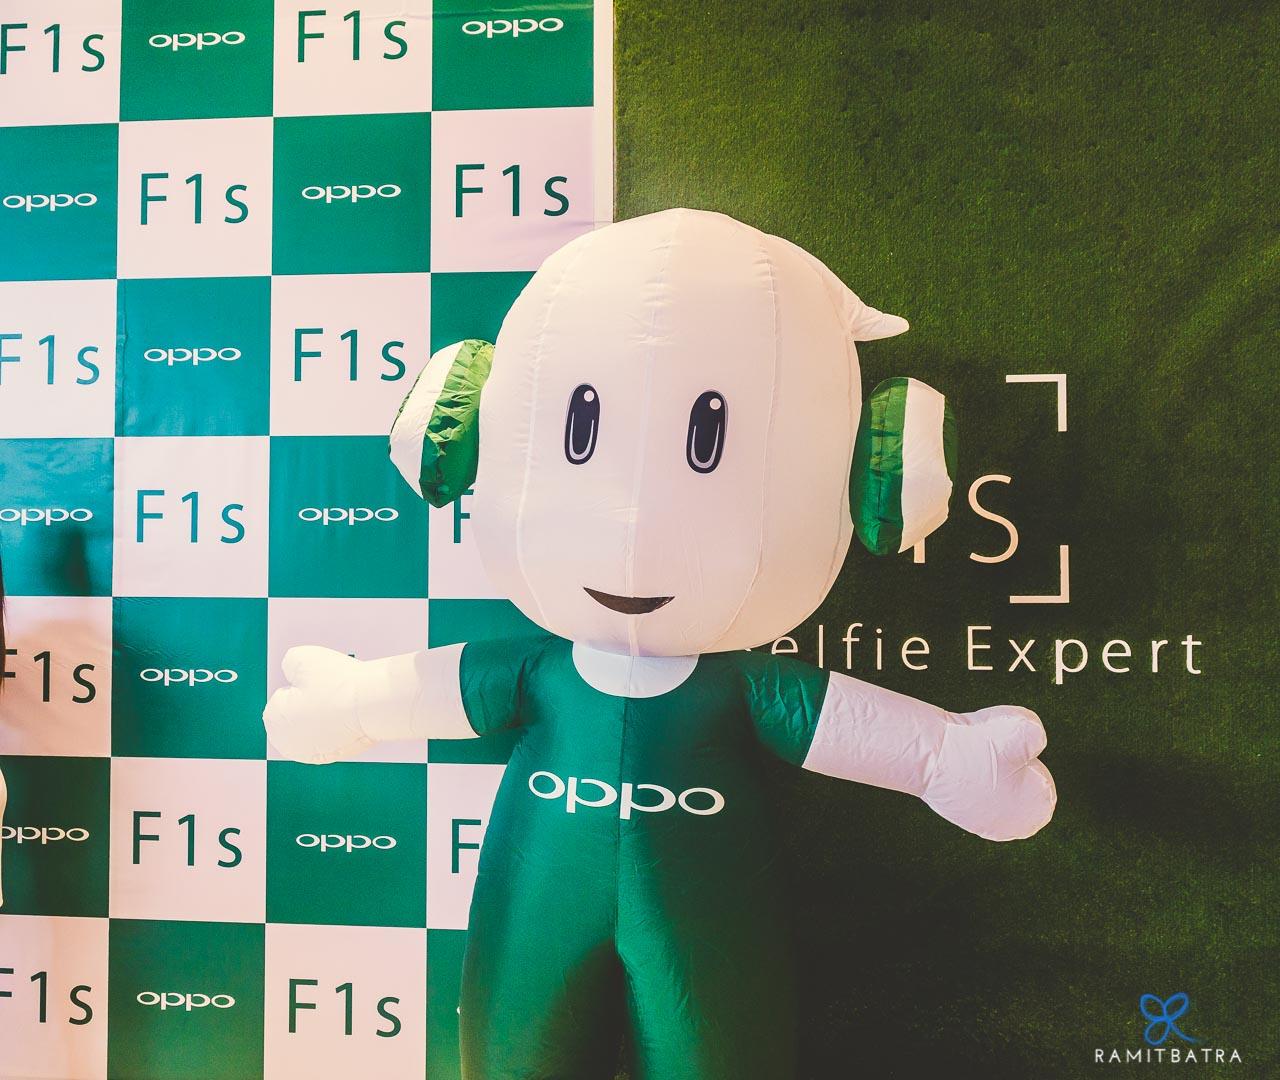 Oppo-F1s-SelfieExpert-RamitBatra-03